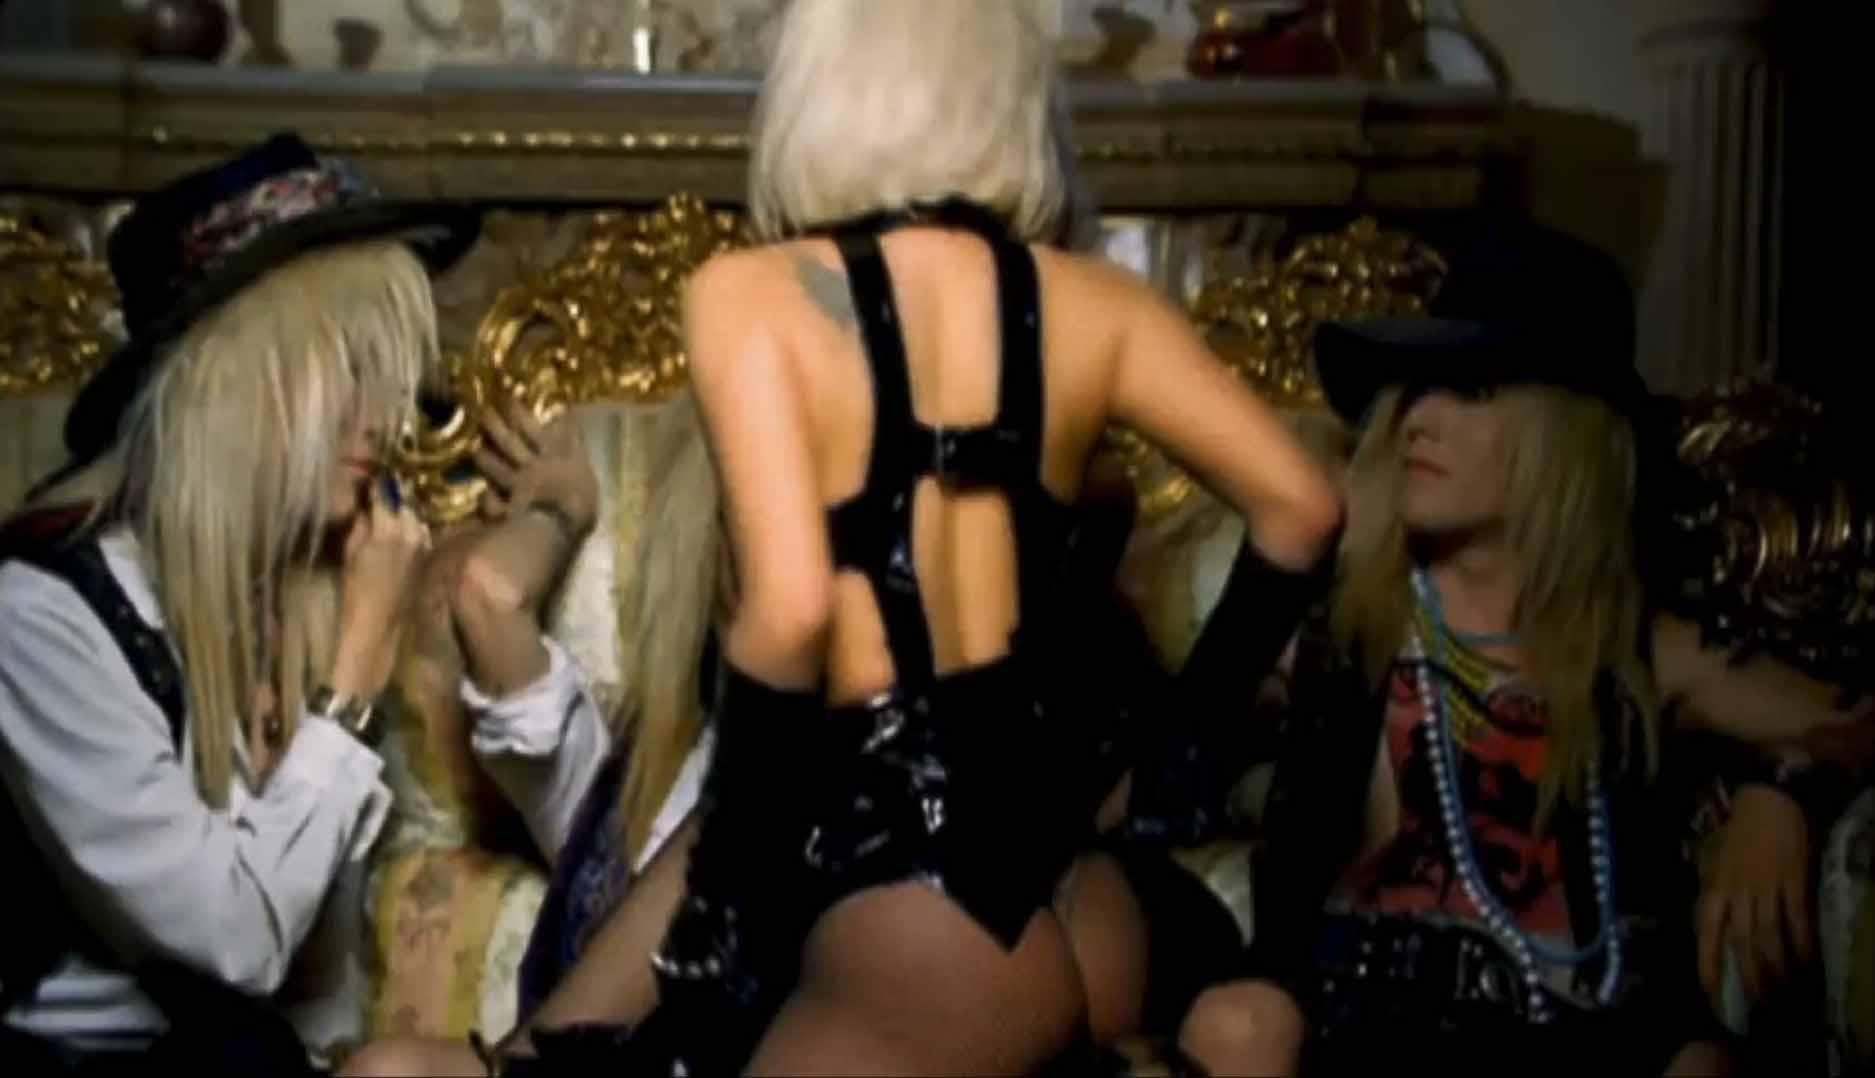 Lady Gaga har da ei lekker sprettrumpe, en Guds gave til mannen? thumbnail